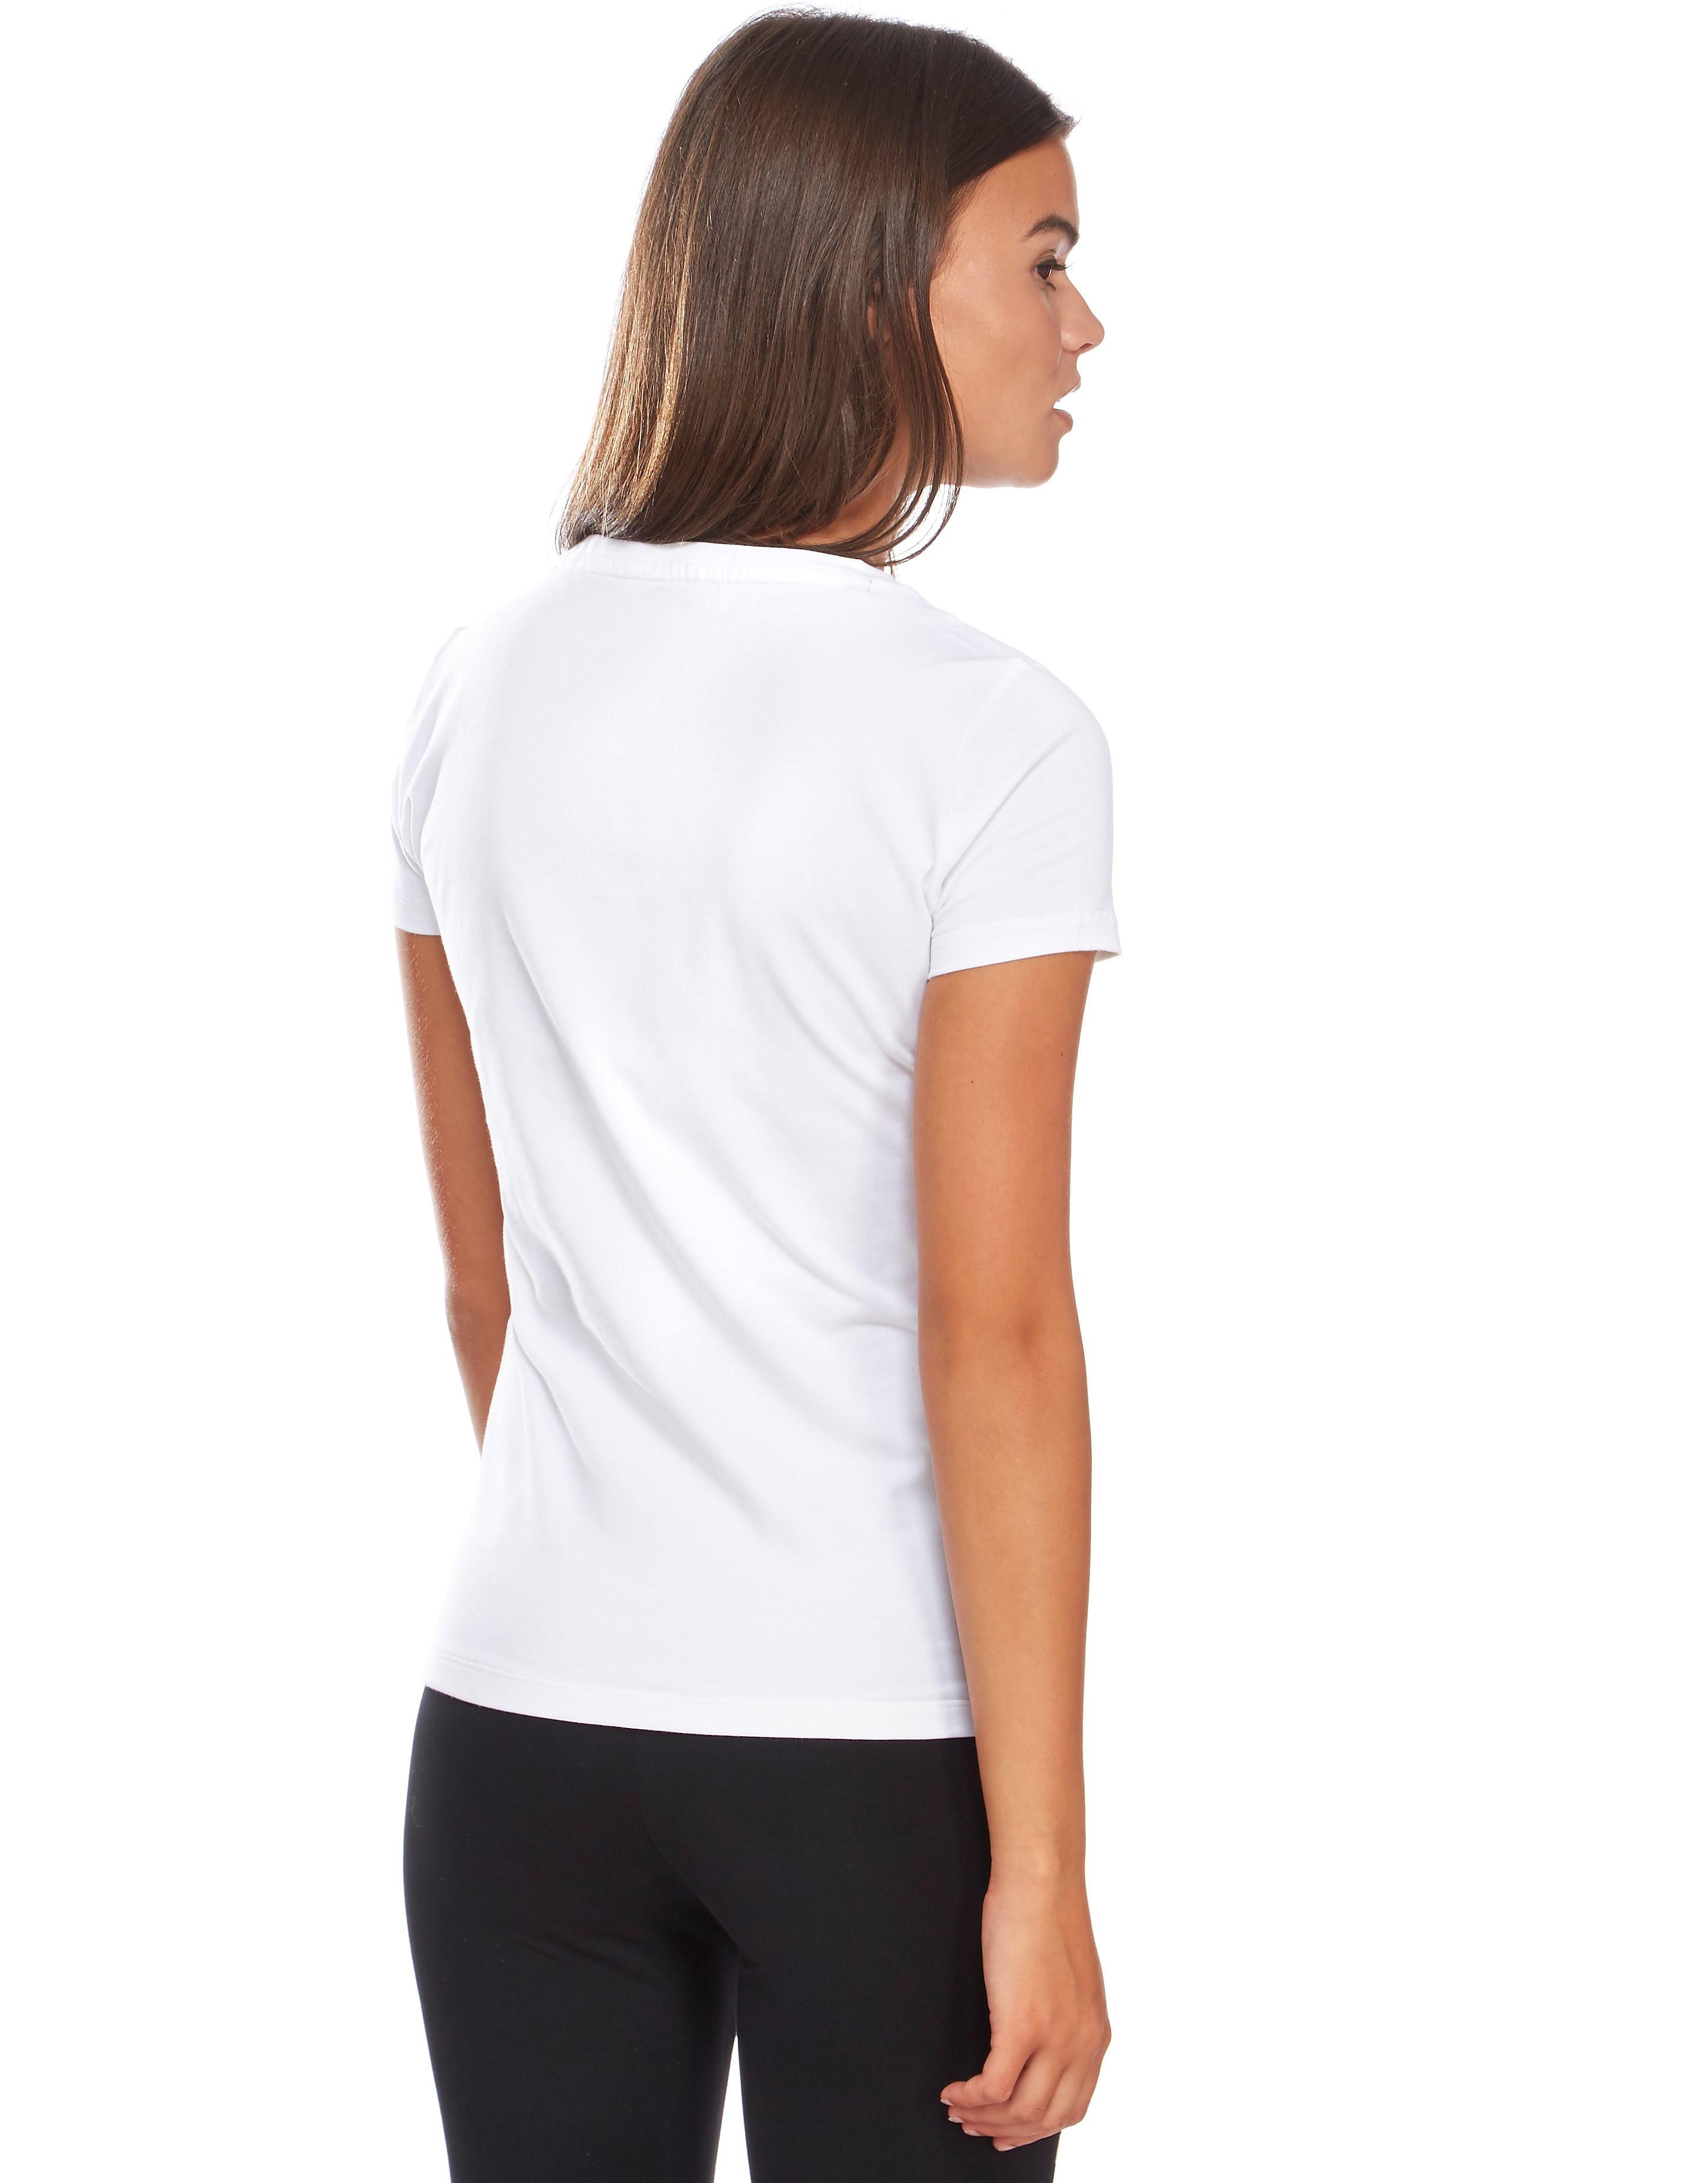 Emporio Armani EA7 Gloss T-Shirt